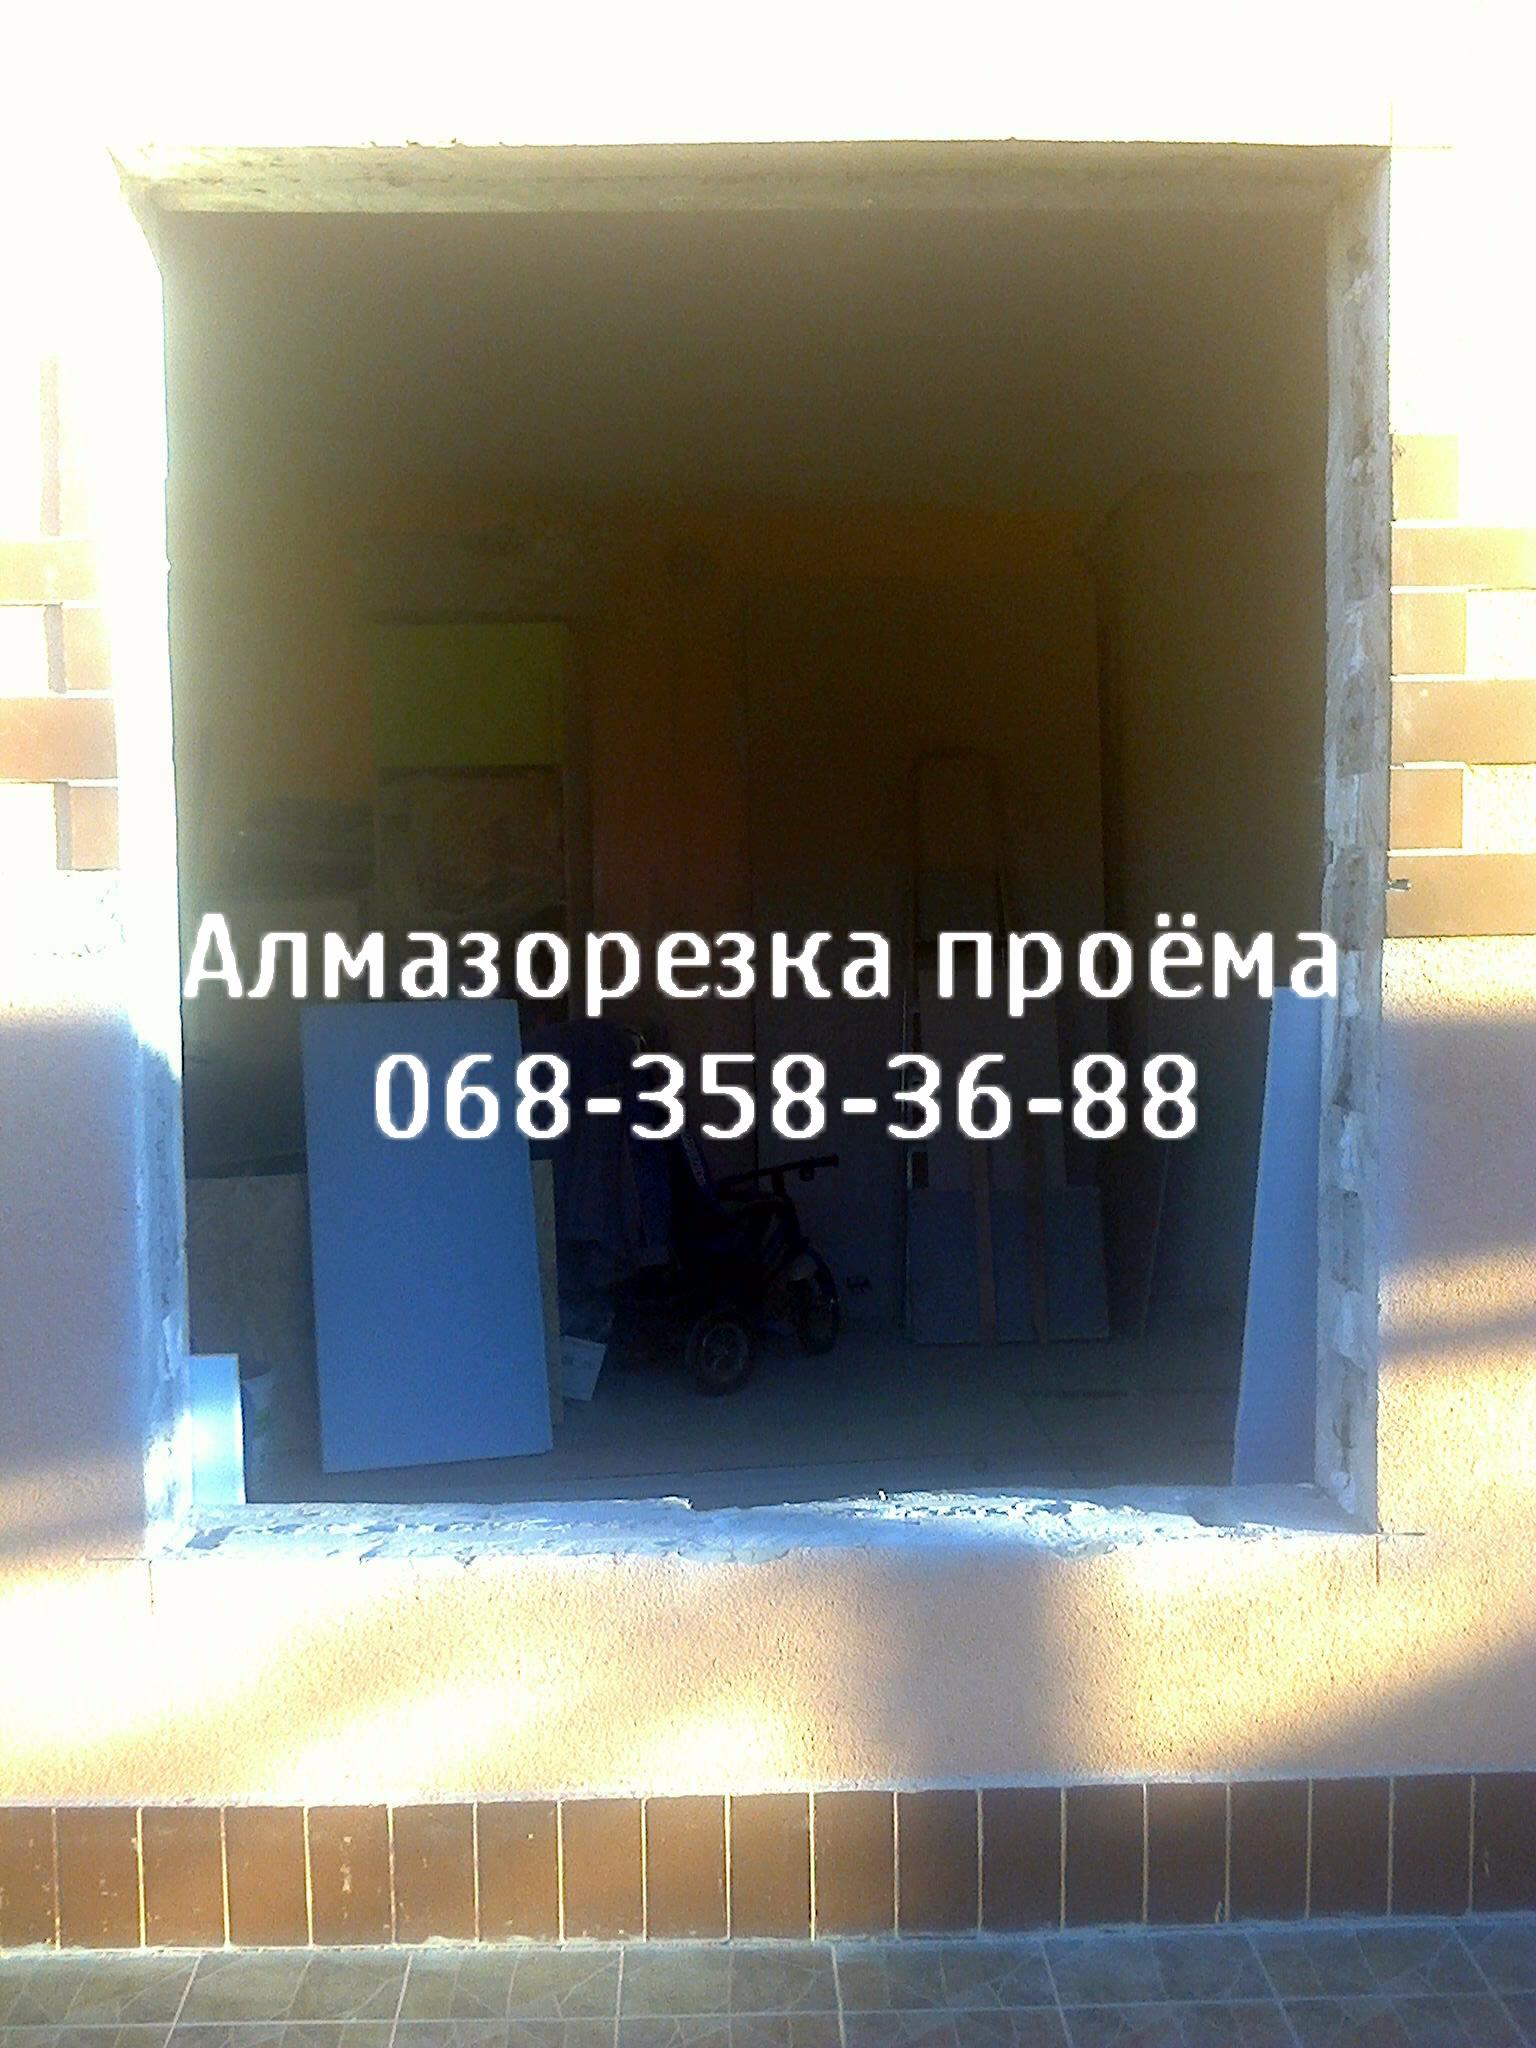 Нажмите на изображение для увеличения Название: Фото0193.jpg Просмотров: 3 Размер:395.5 Кб ID:435399